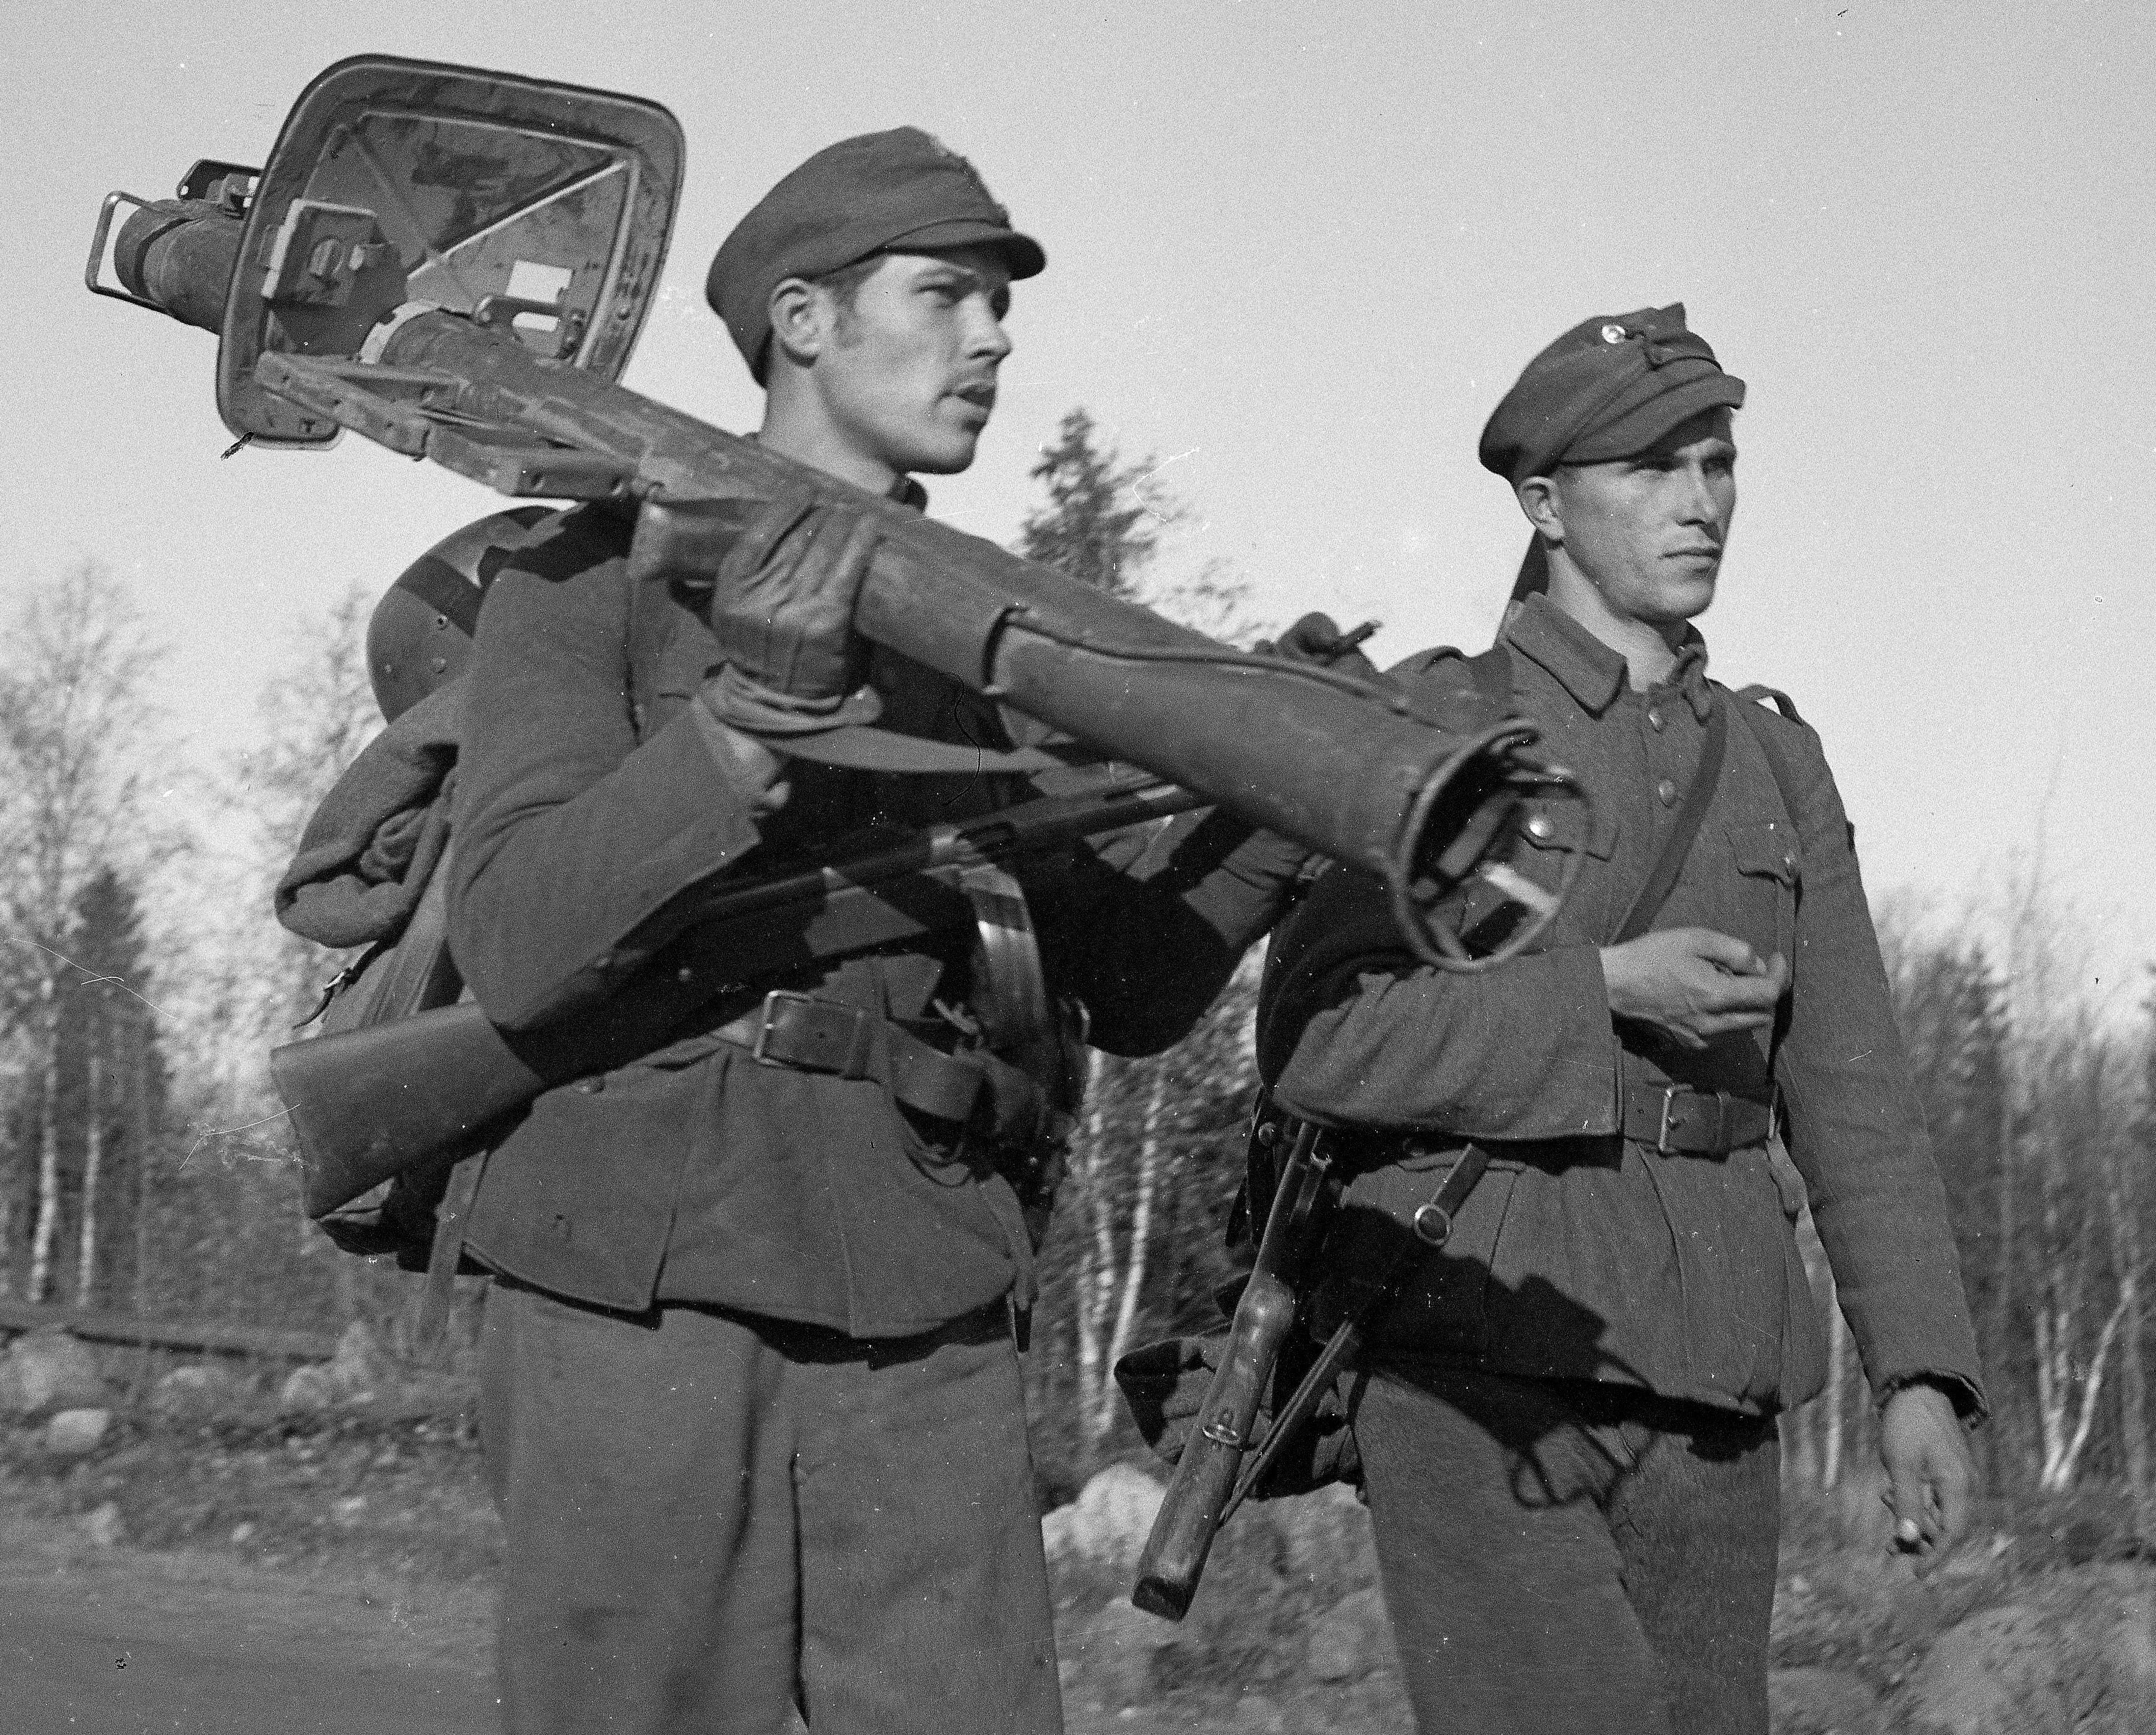 FinnishTroops_Tornio1944_002.jpg